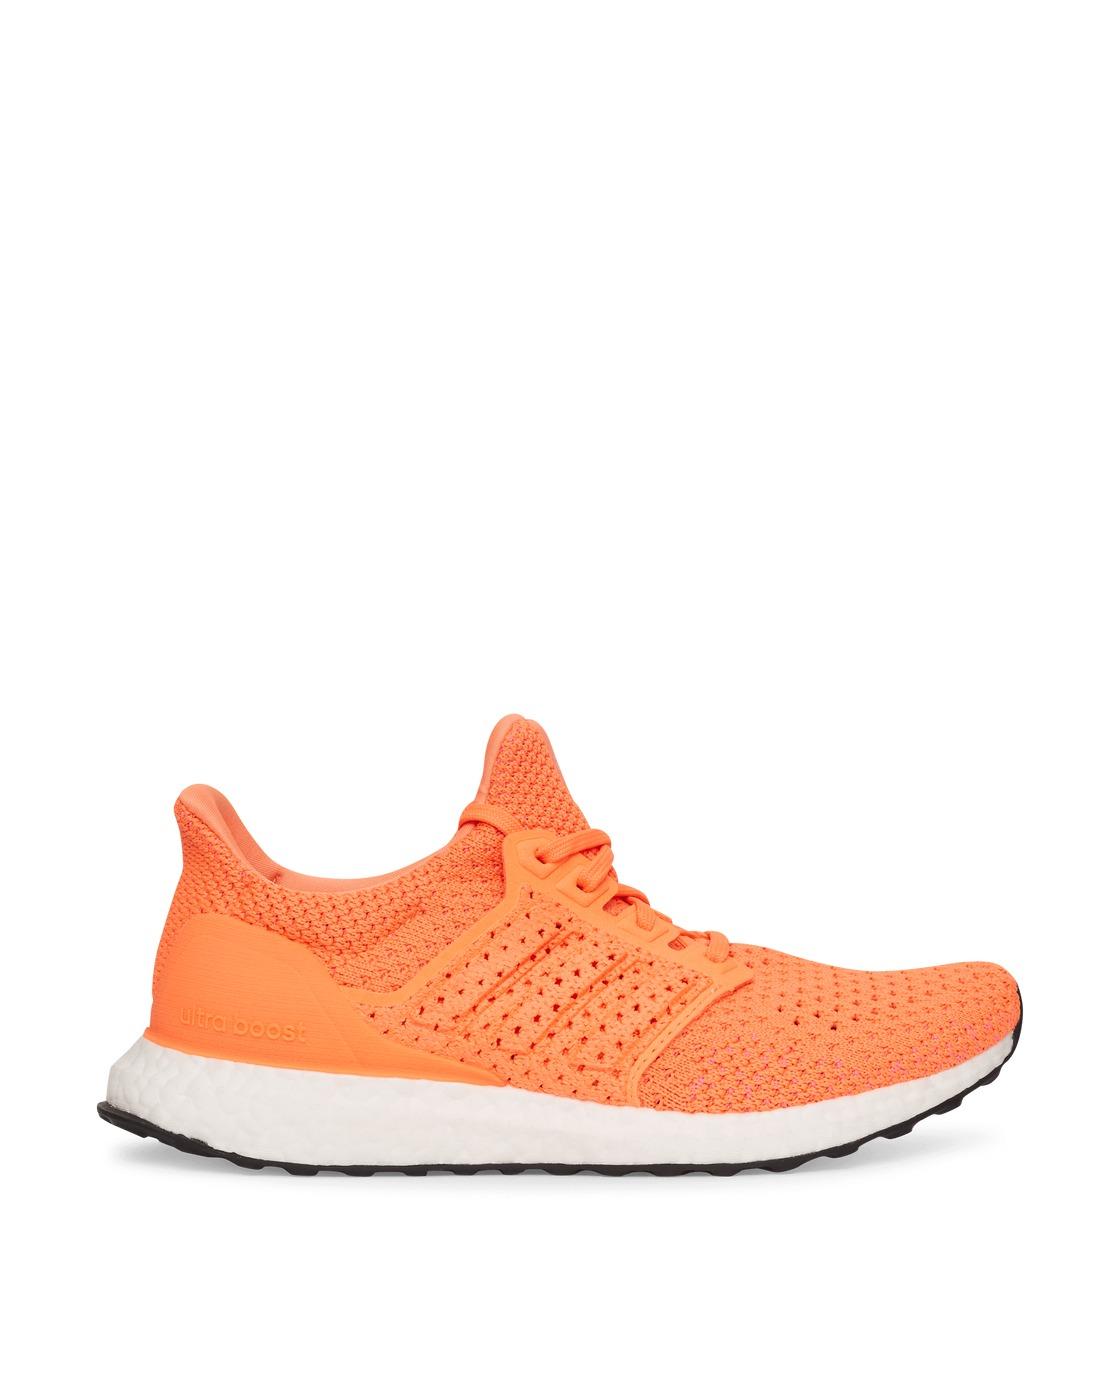 Adidas Originals Ultraboost Clima Dna Sneakers Screaming Orange